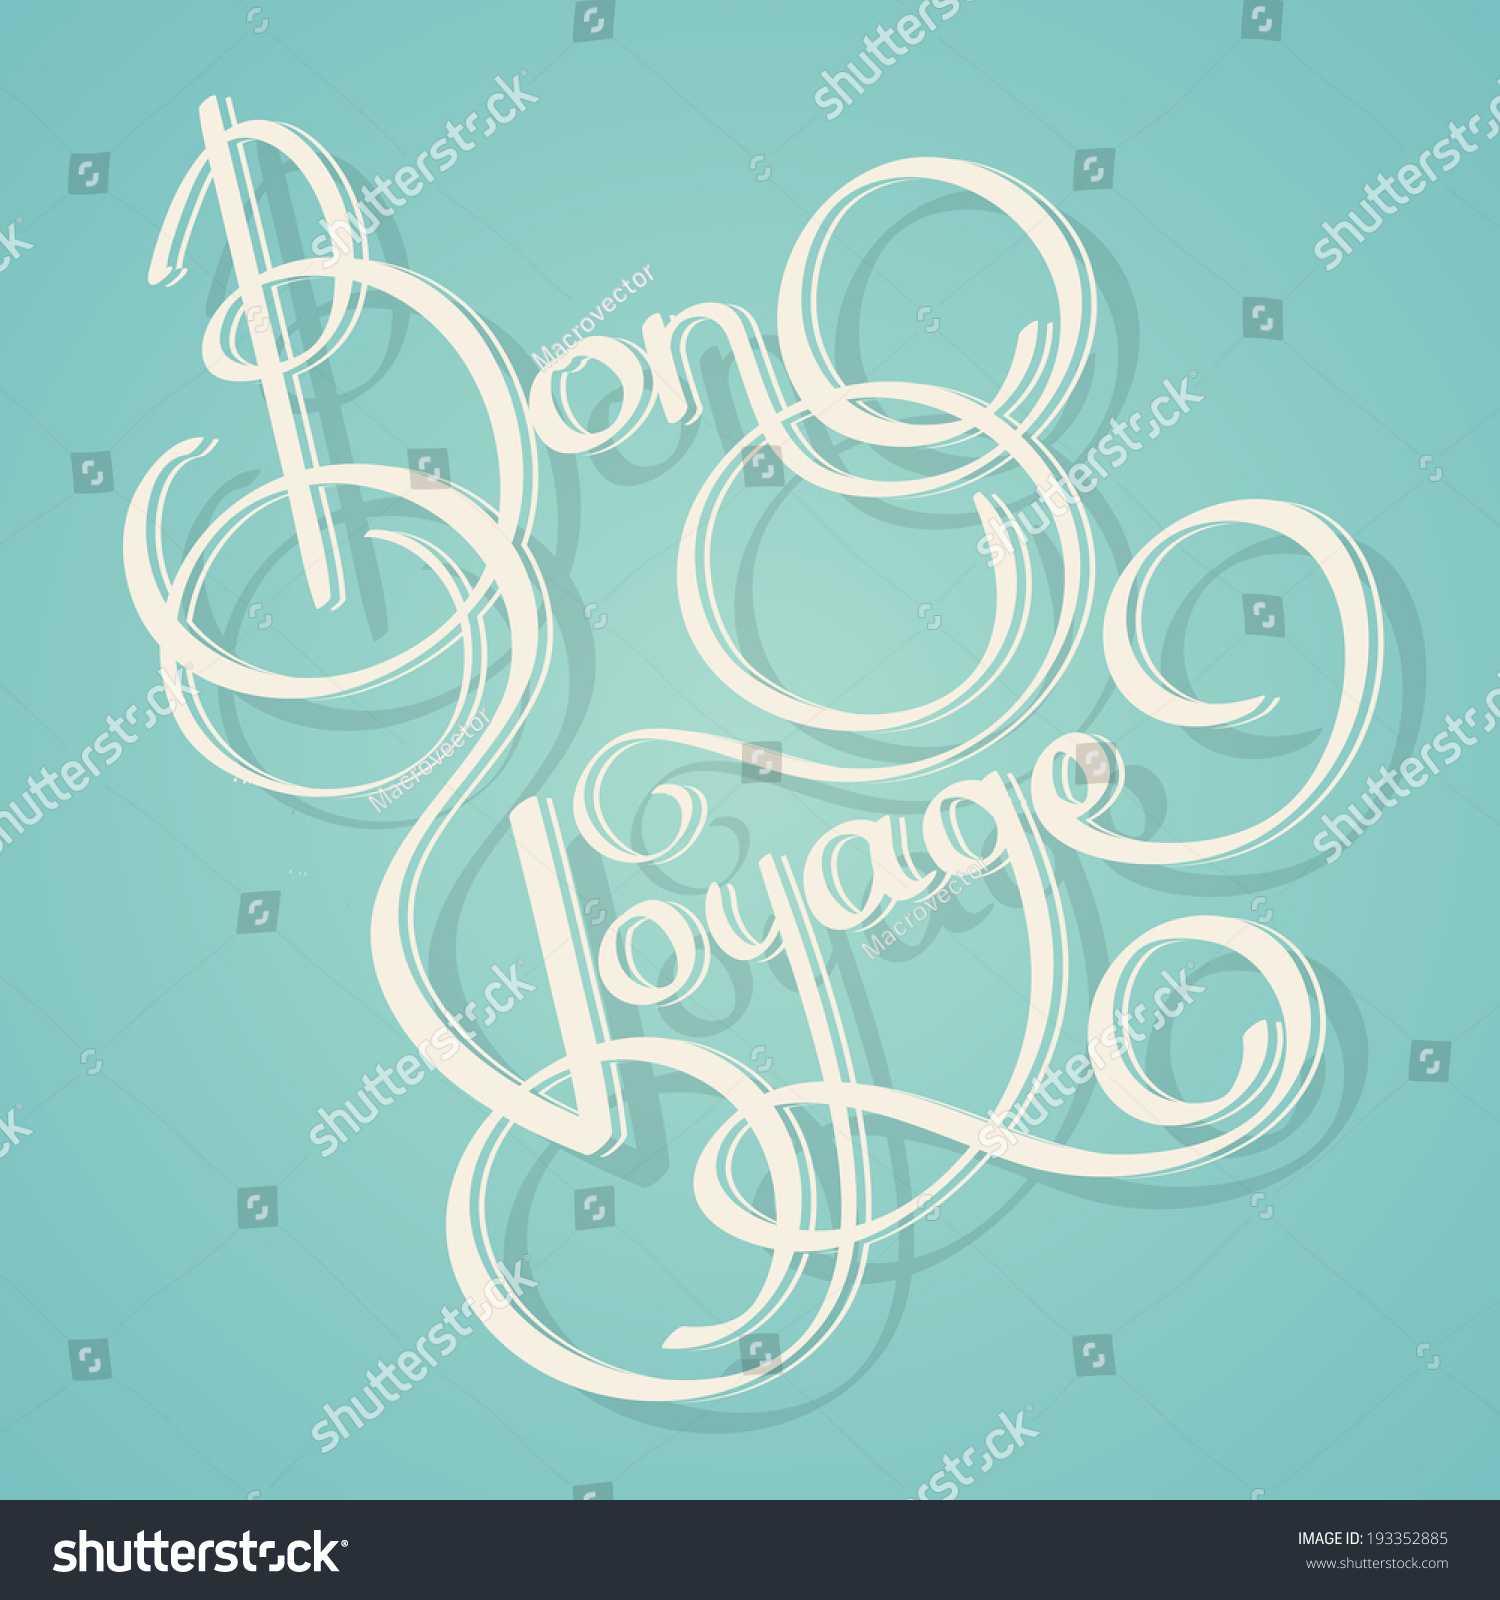 Calligraphy Bon Voyage Vintage Lettering Postcard Stock intended for Bon Voyage Card Template